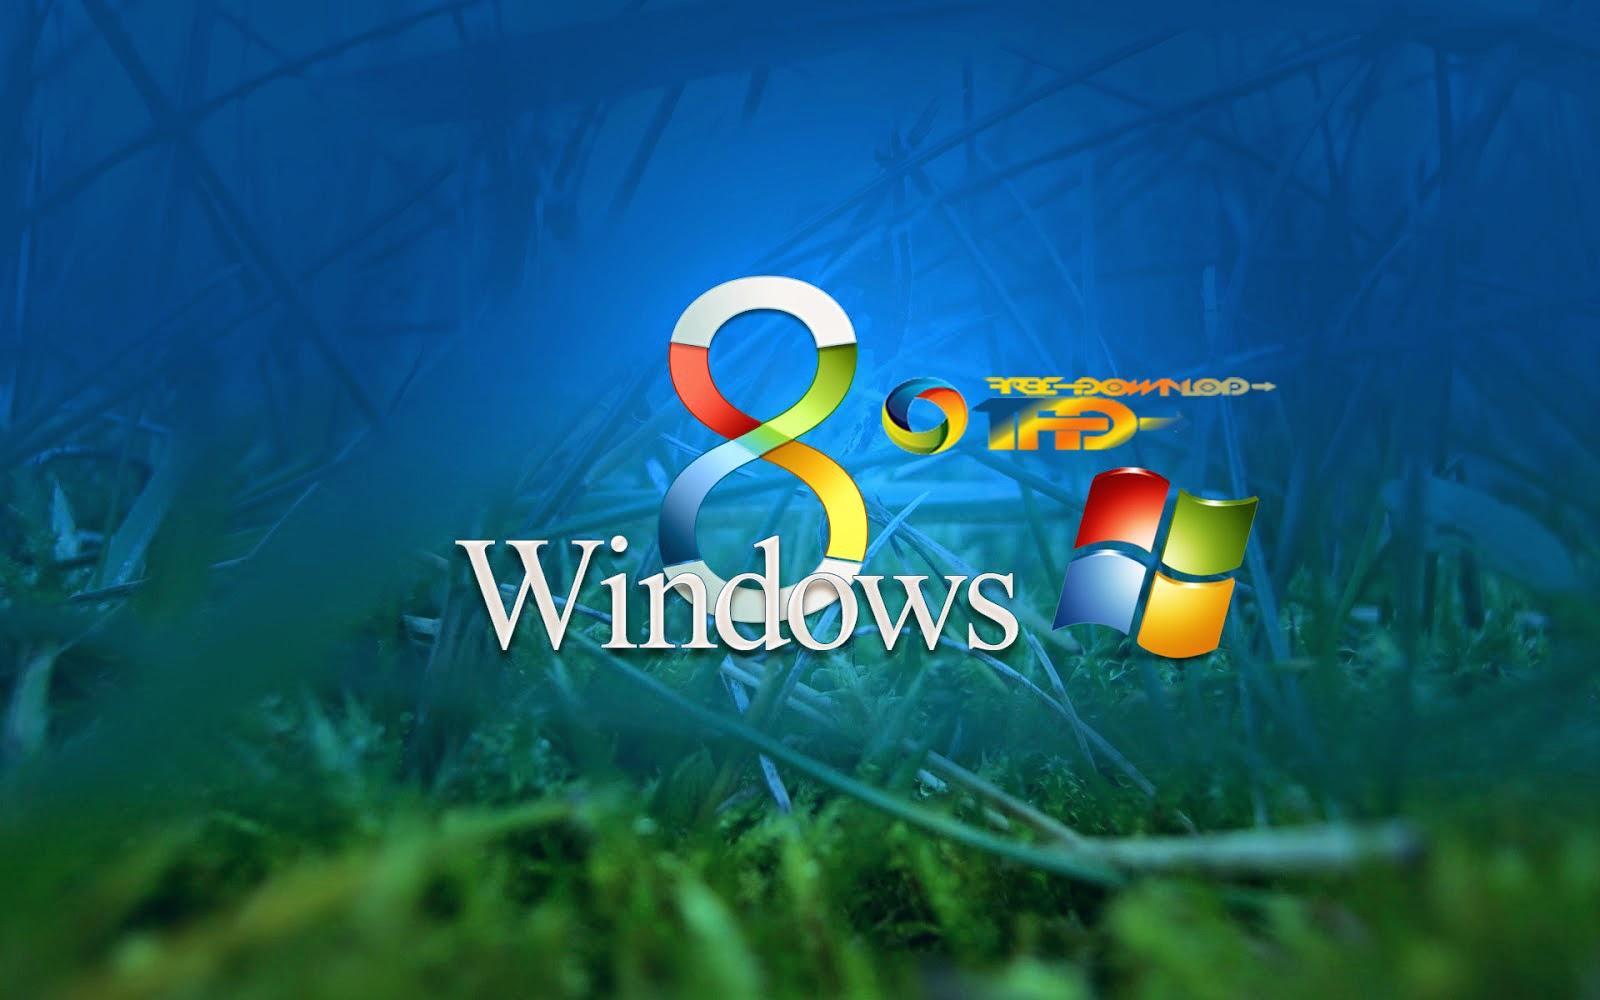 Windows 8 Pro ISO 32 Bit / 64 Bit Serial Key